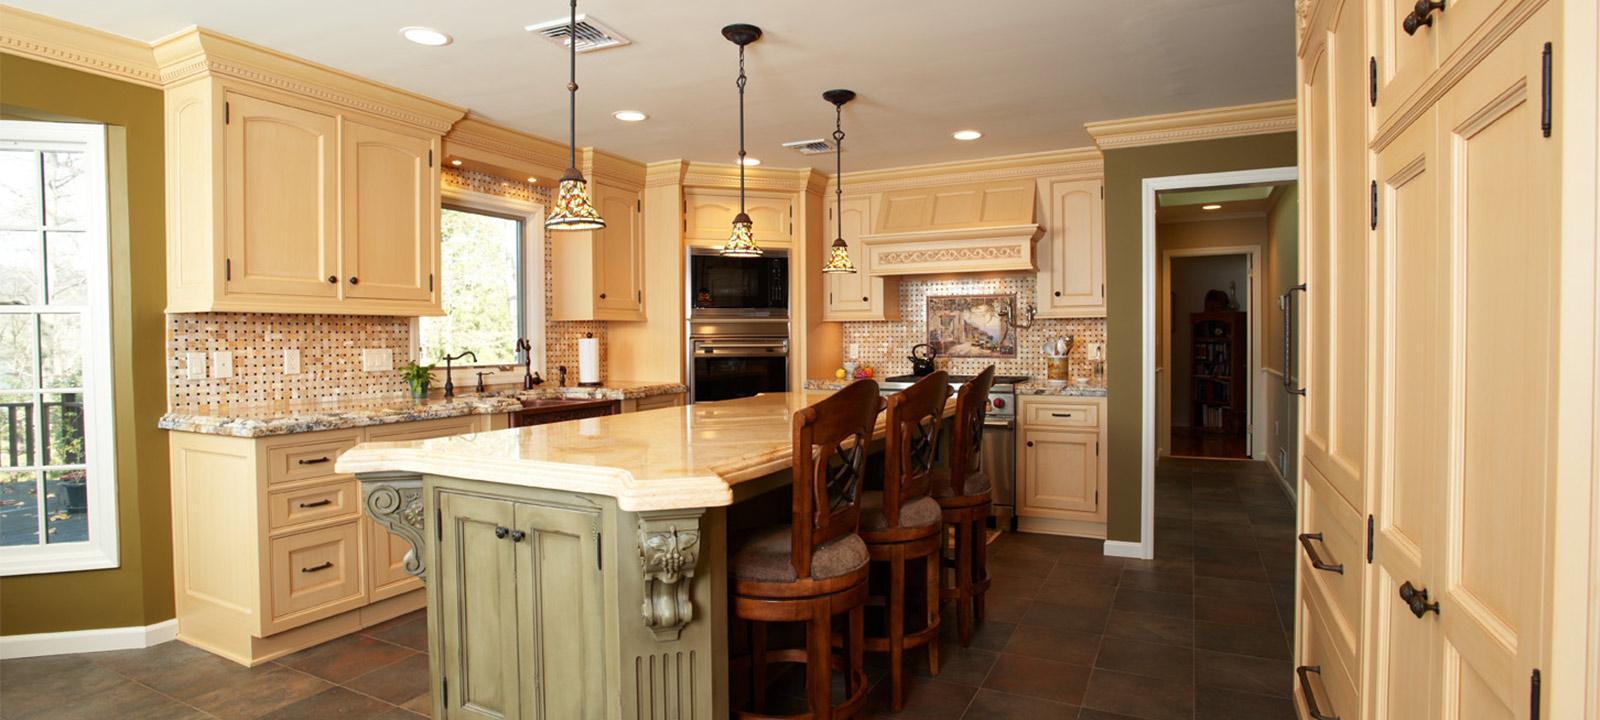 Kitchen Cabinets Westchester County Ny Interesting Kitchen Cabinets ...